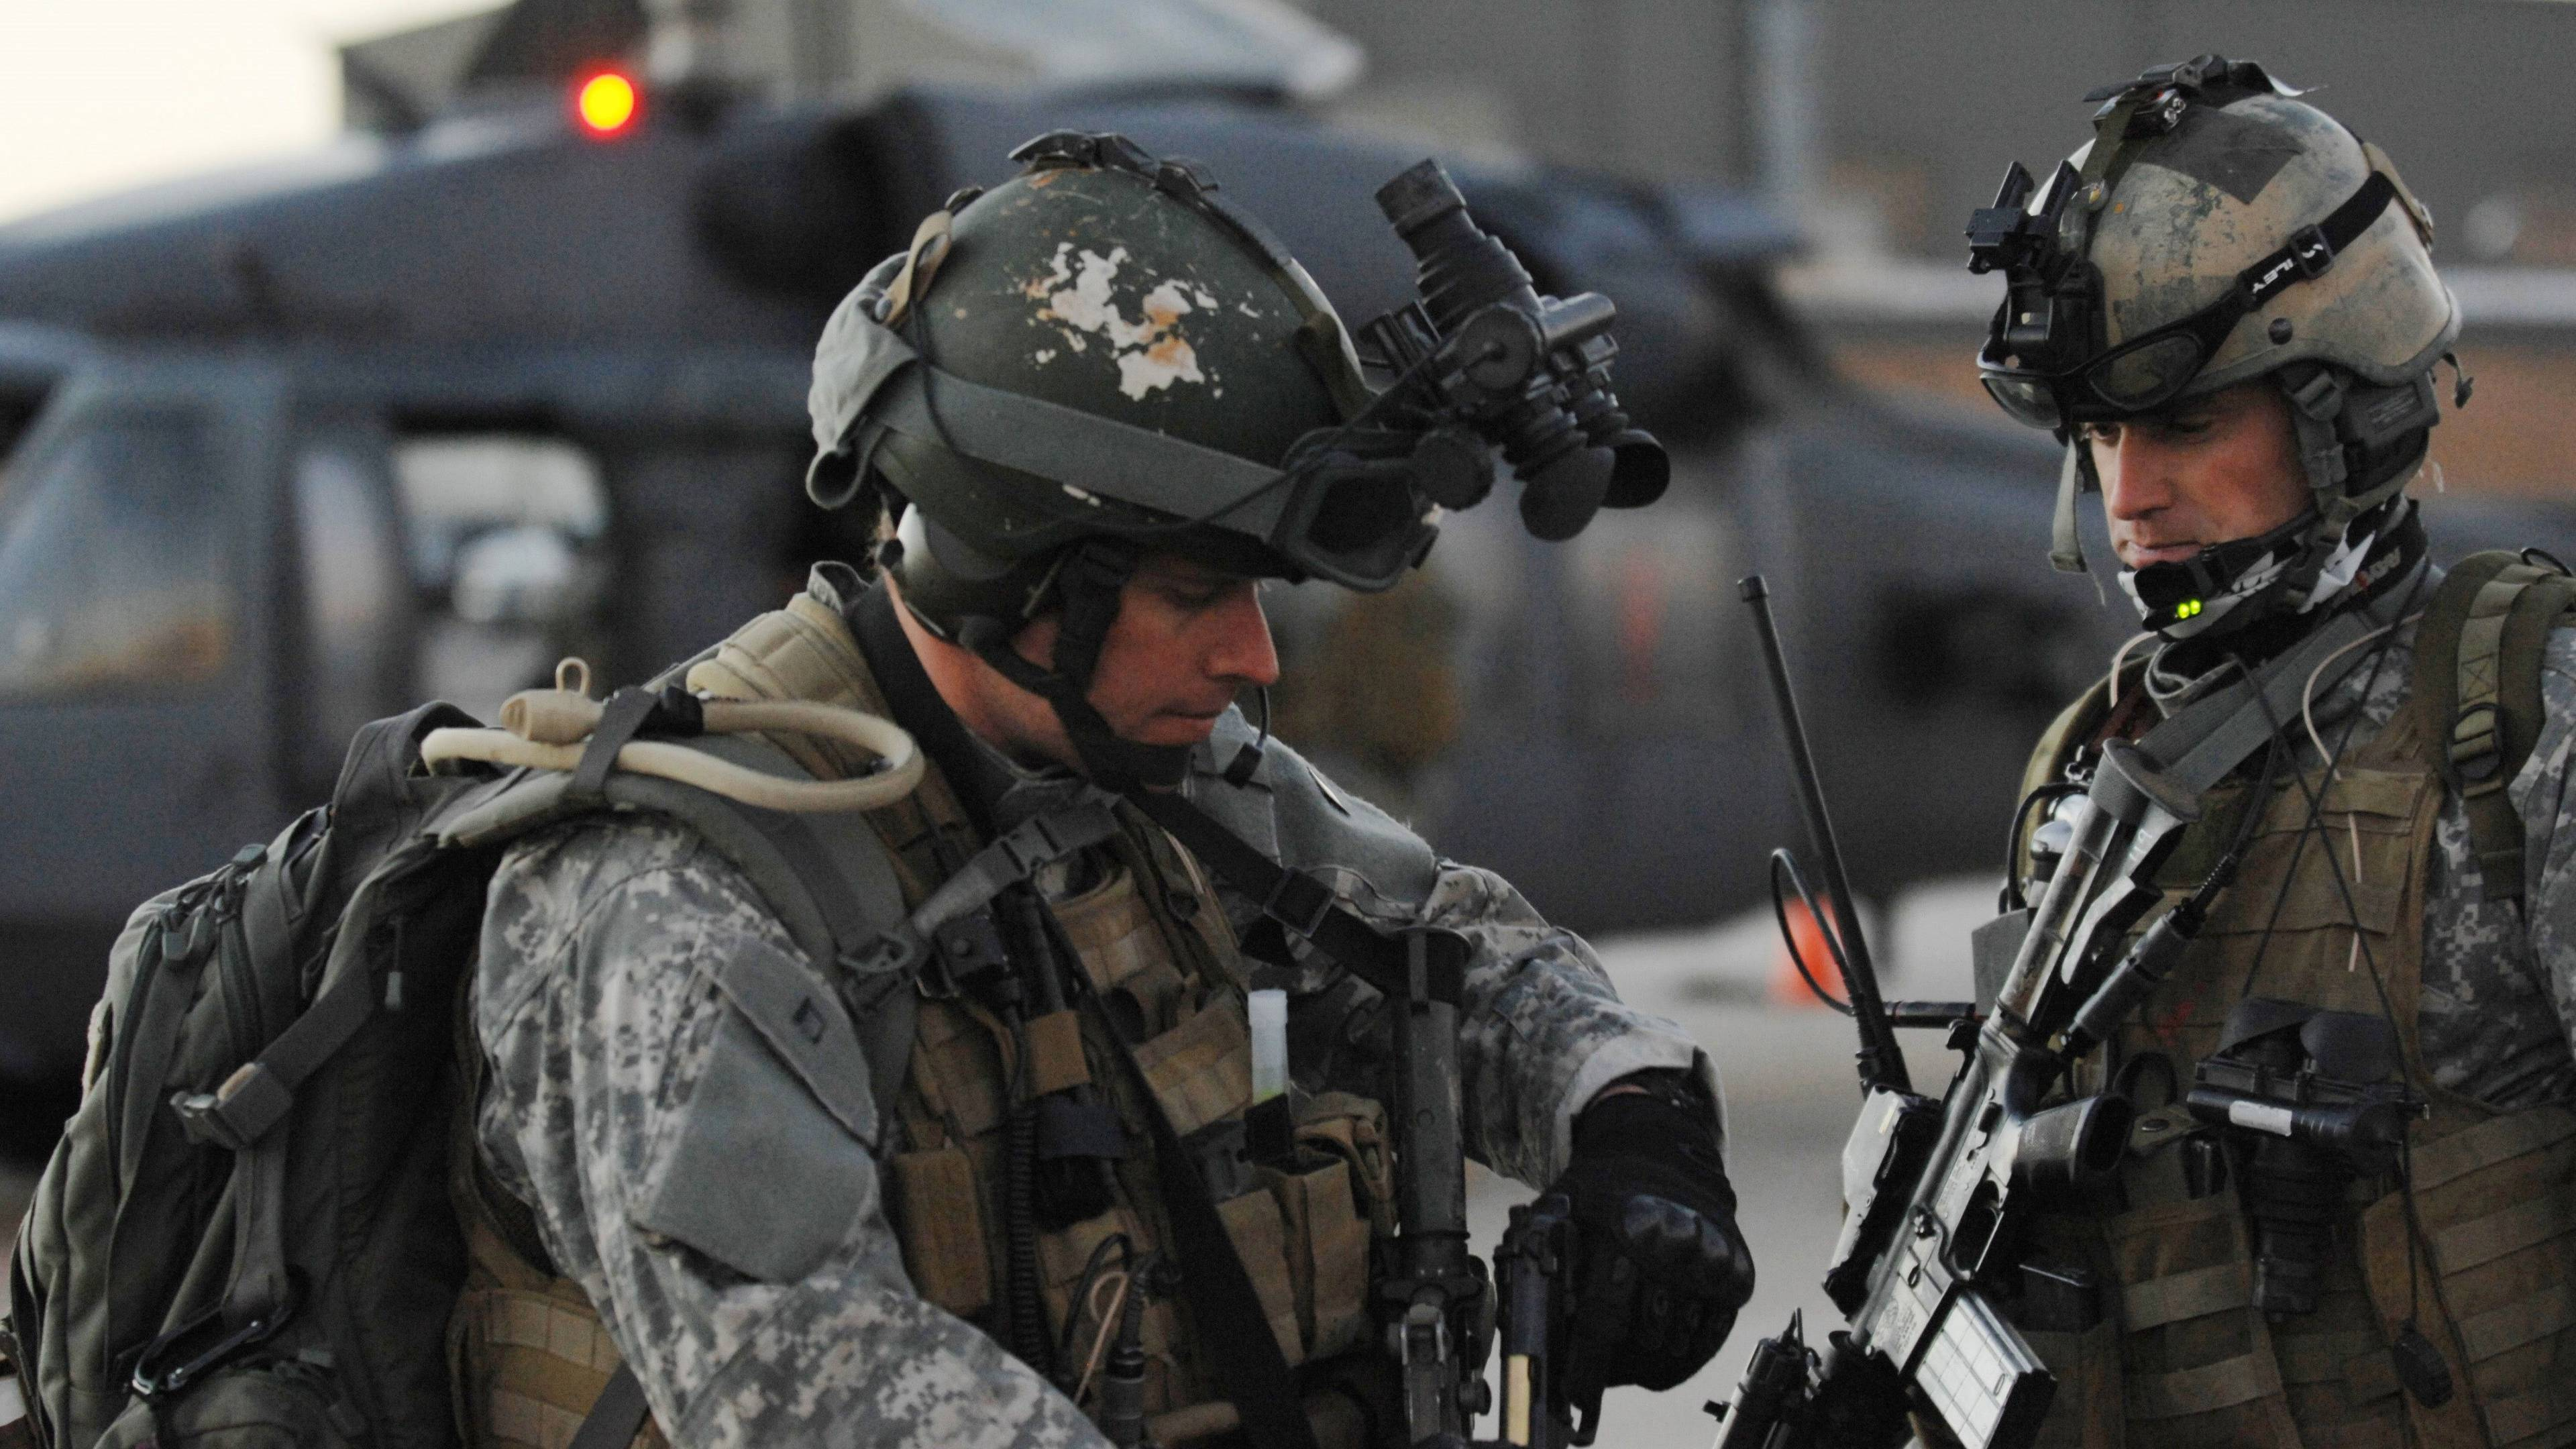 Images of Delta Force Operators - #rock-cafe